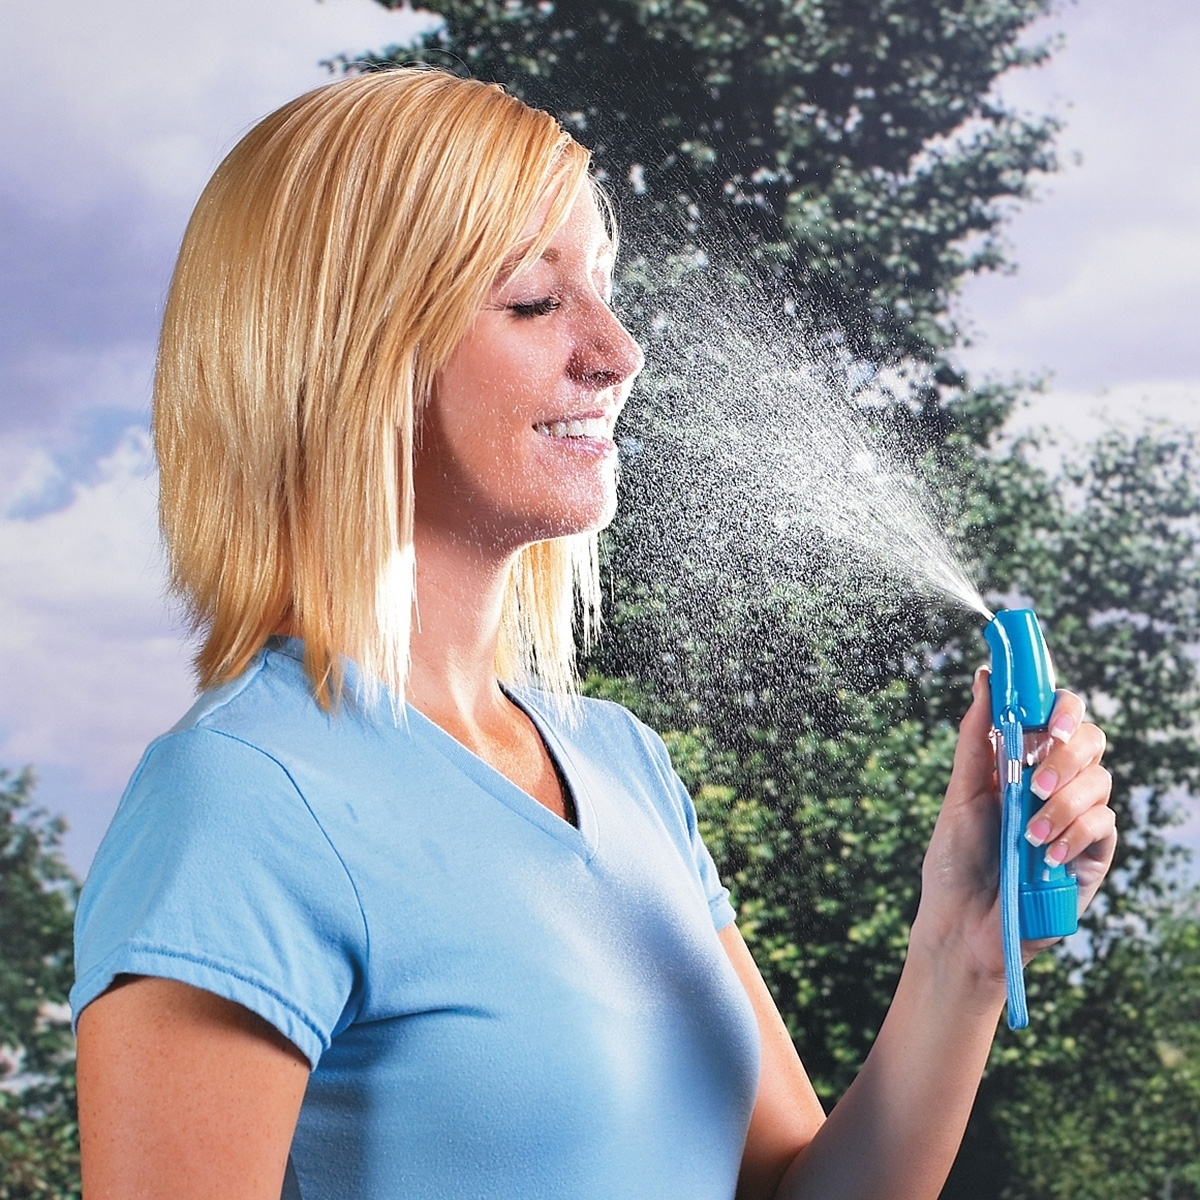 Mini Personal Spray Mister